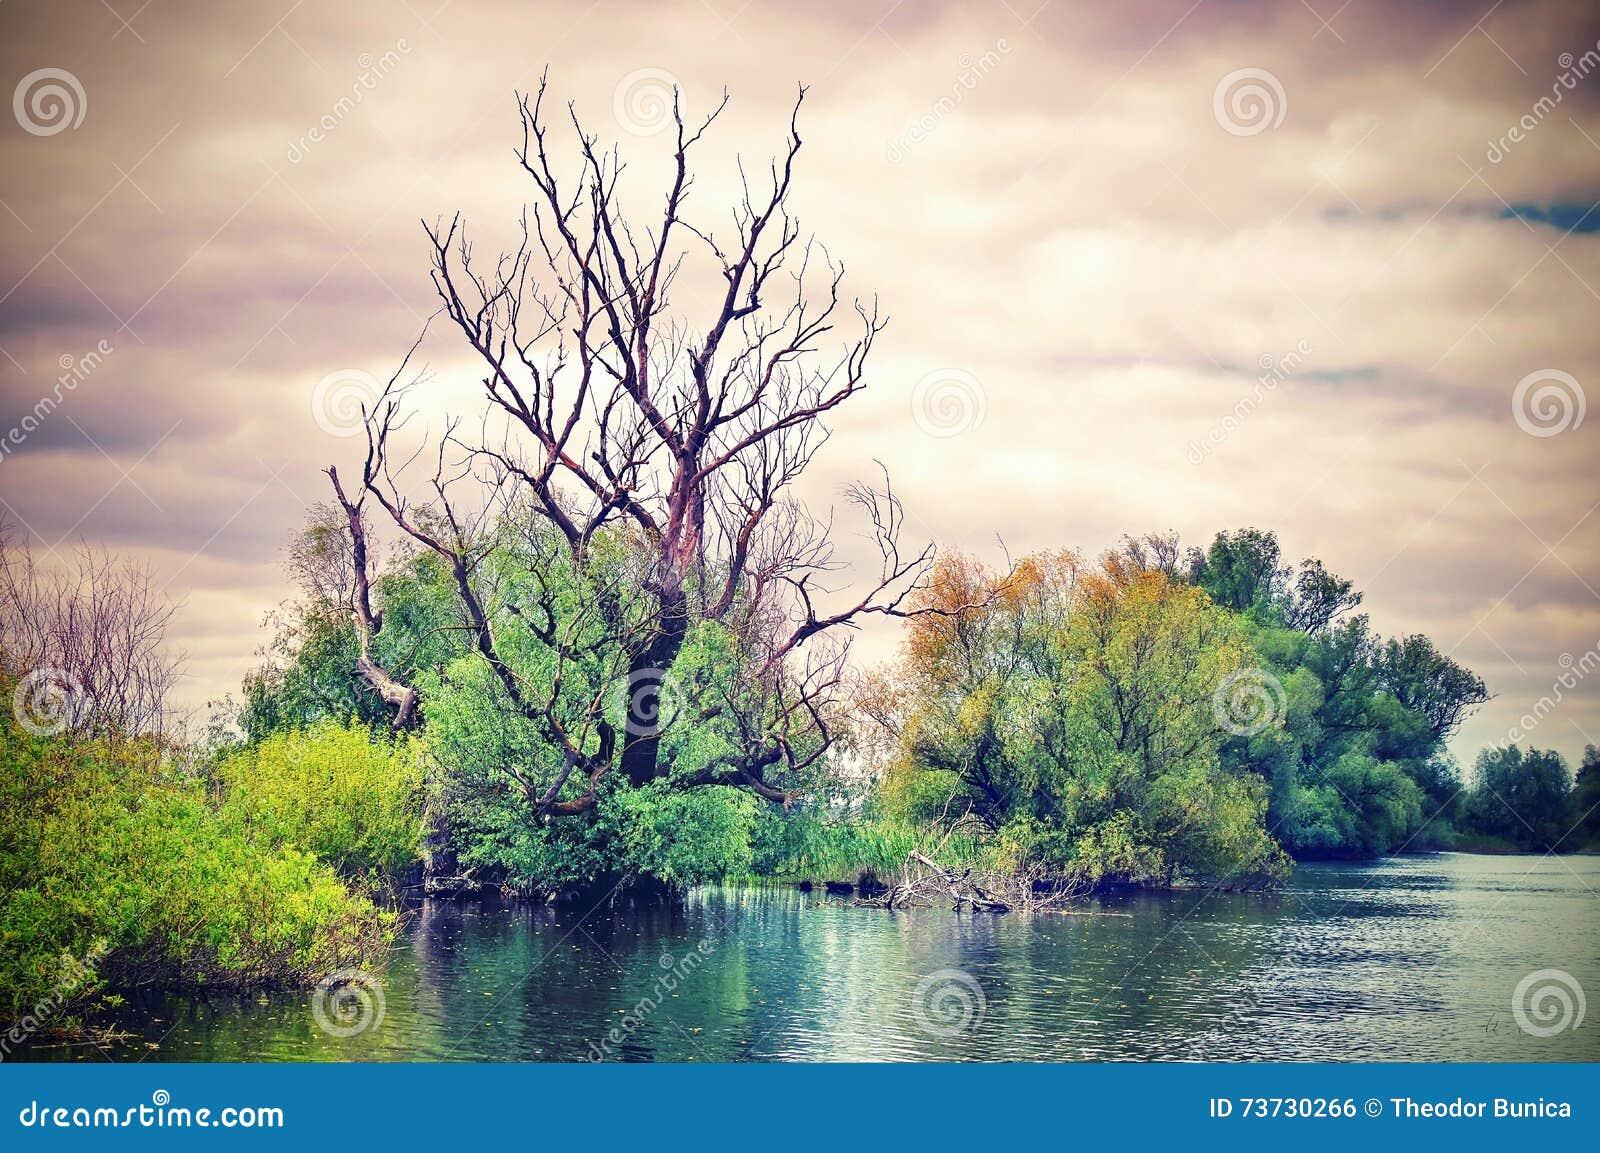 Danube River. Superb dramatic landscape in natural reserve of the Danube Delta - landmark attraction in Romania